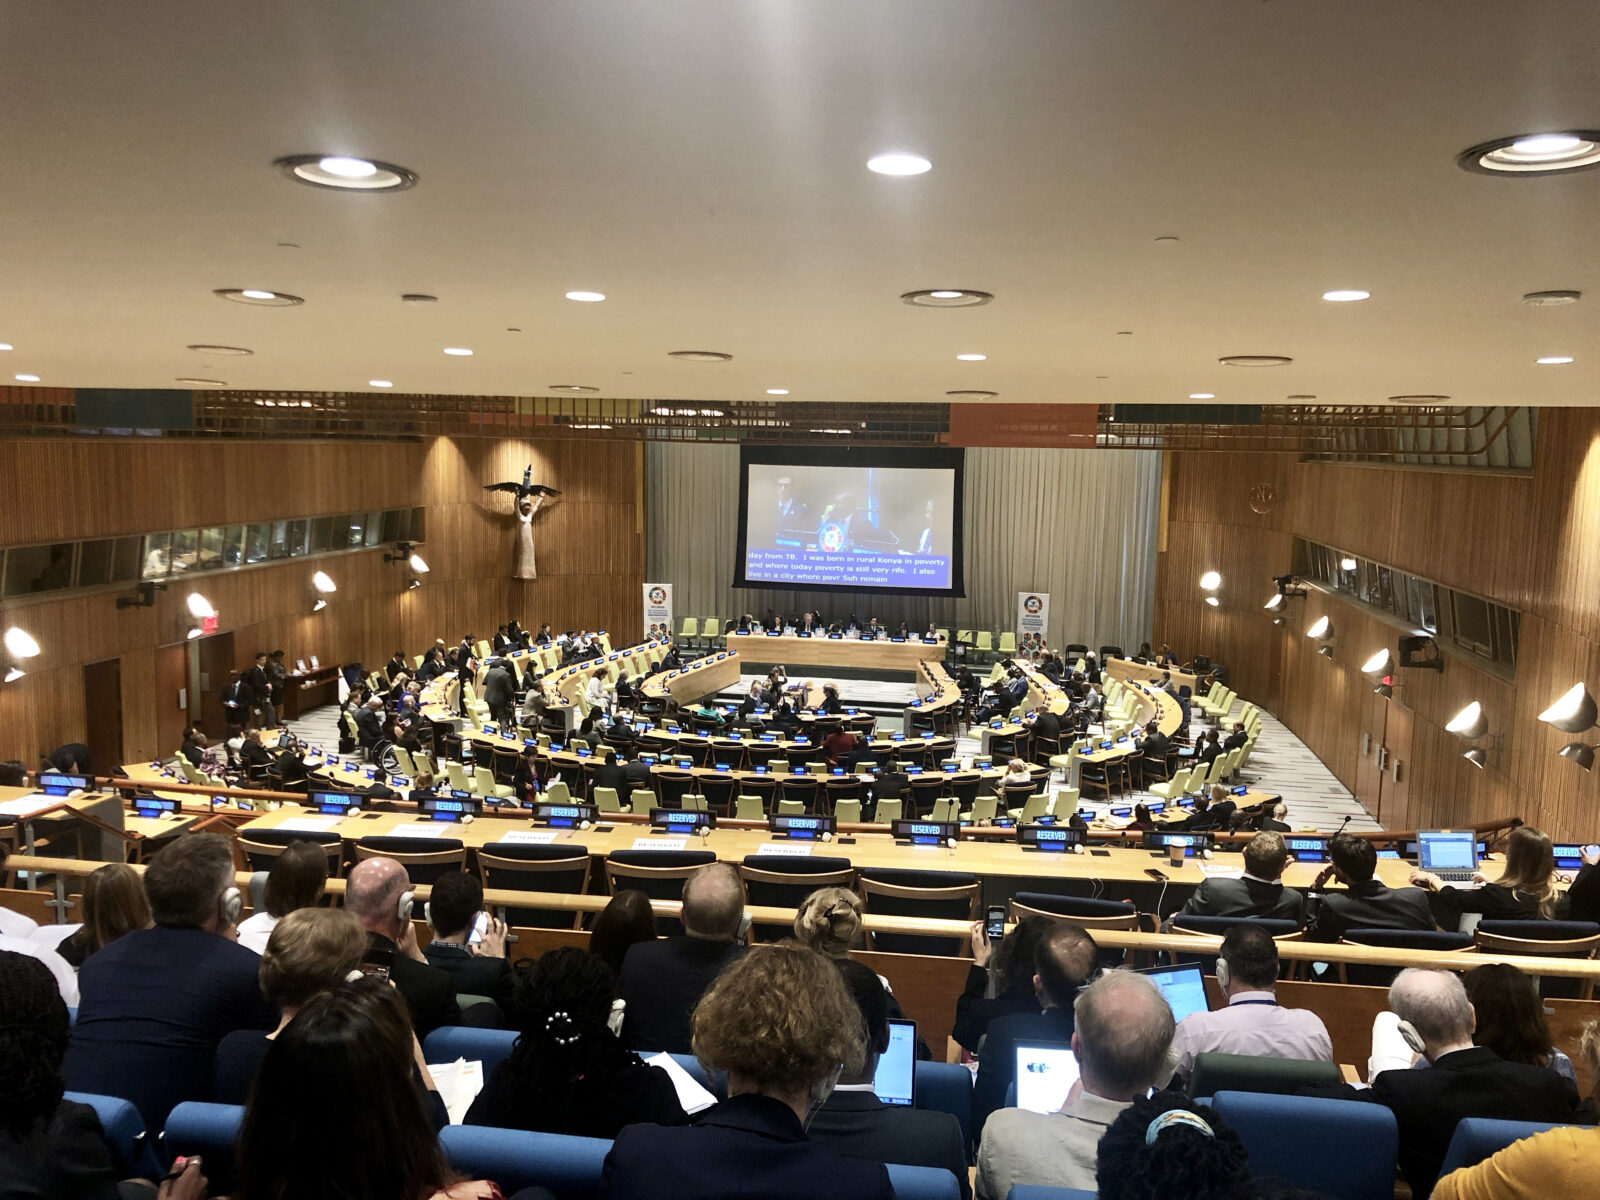 Möte i stor sal i FN-byggnaden